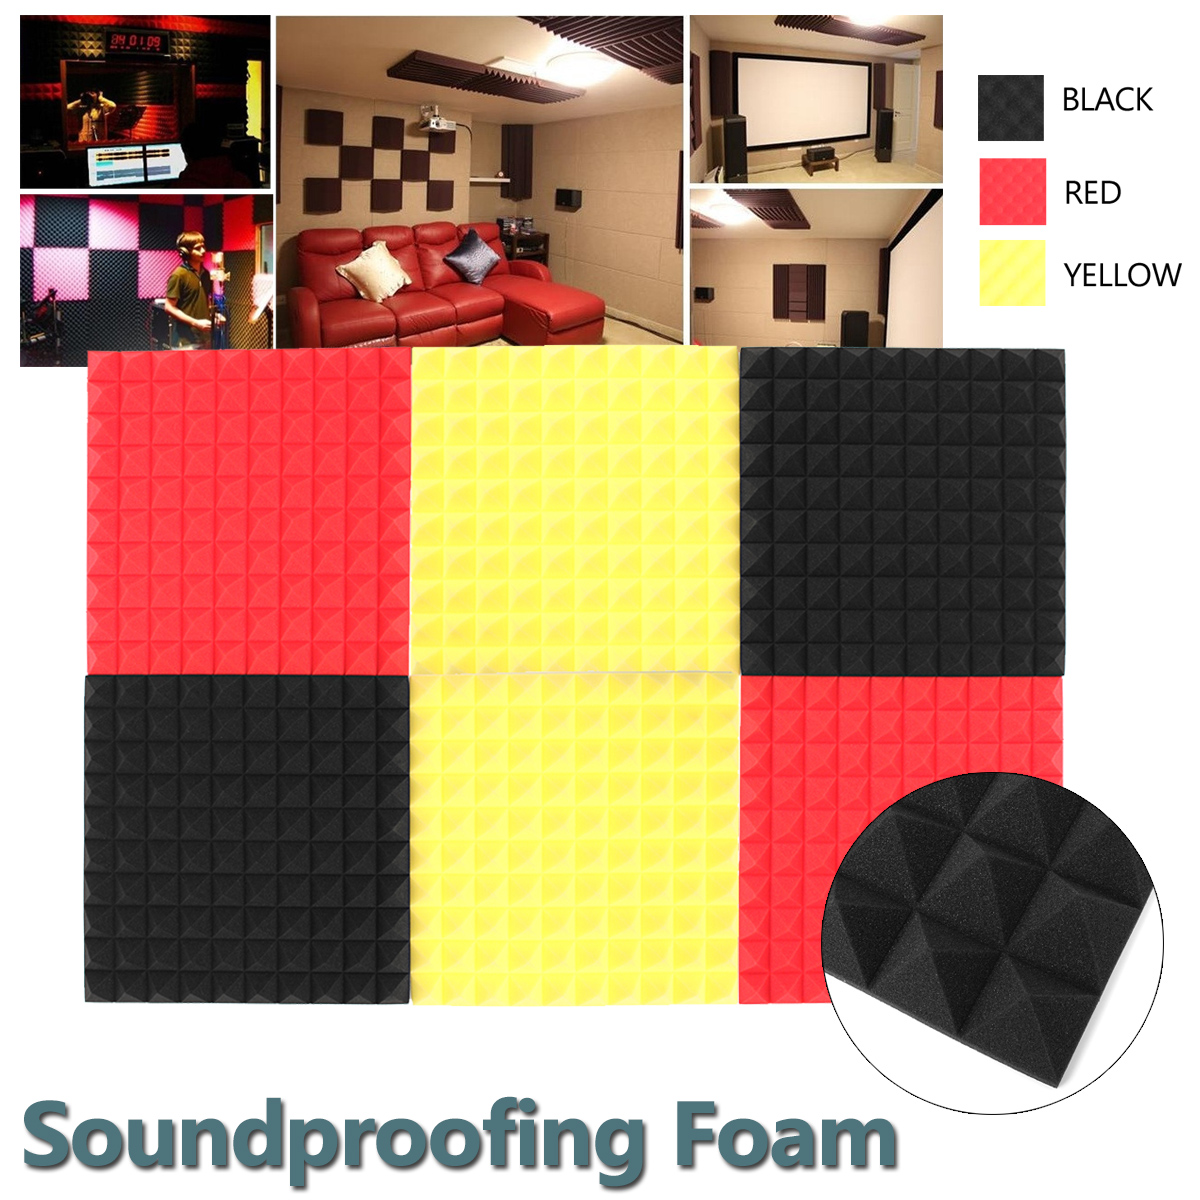 1PCS 50x50x4cm Acoustic Foam Soundproofing Foam Studio KTV Room Wall Acoustic Foam Soundproofing Treatment Absorption Tile Wedge